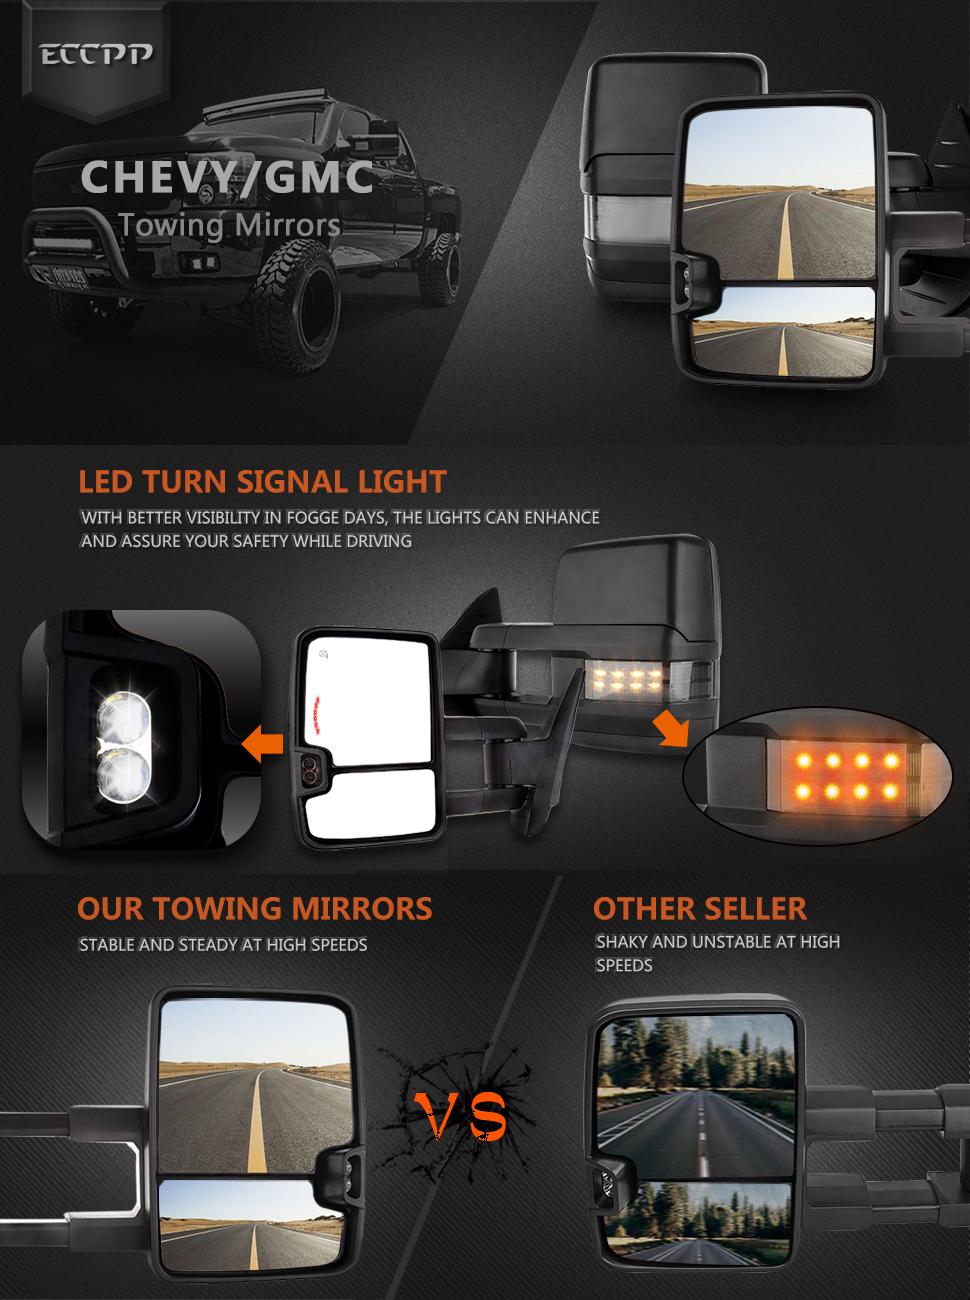 2009 Silverado Tow Mirror Wiring Diagram: Amazon.com: ECCPP Towing Mirrors High Performance Automotive rh:amazon.com,Design